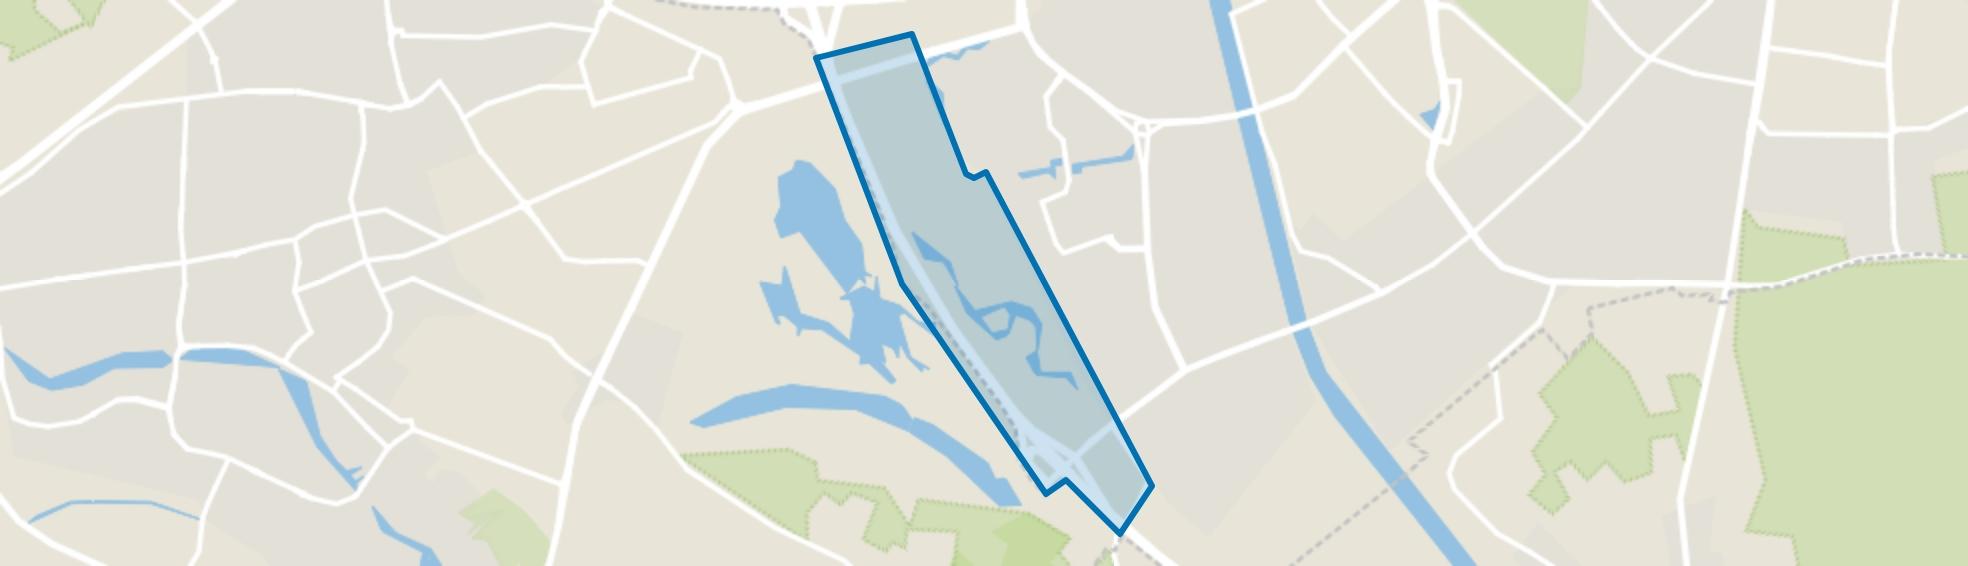 Staddijk, Nijmegen map